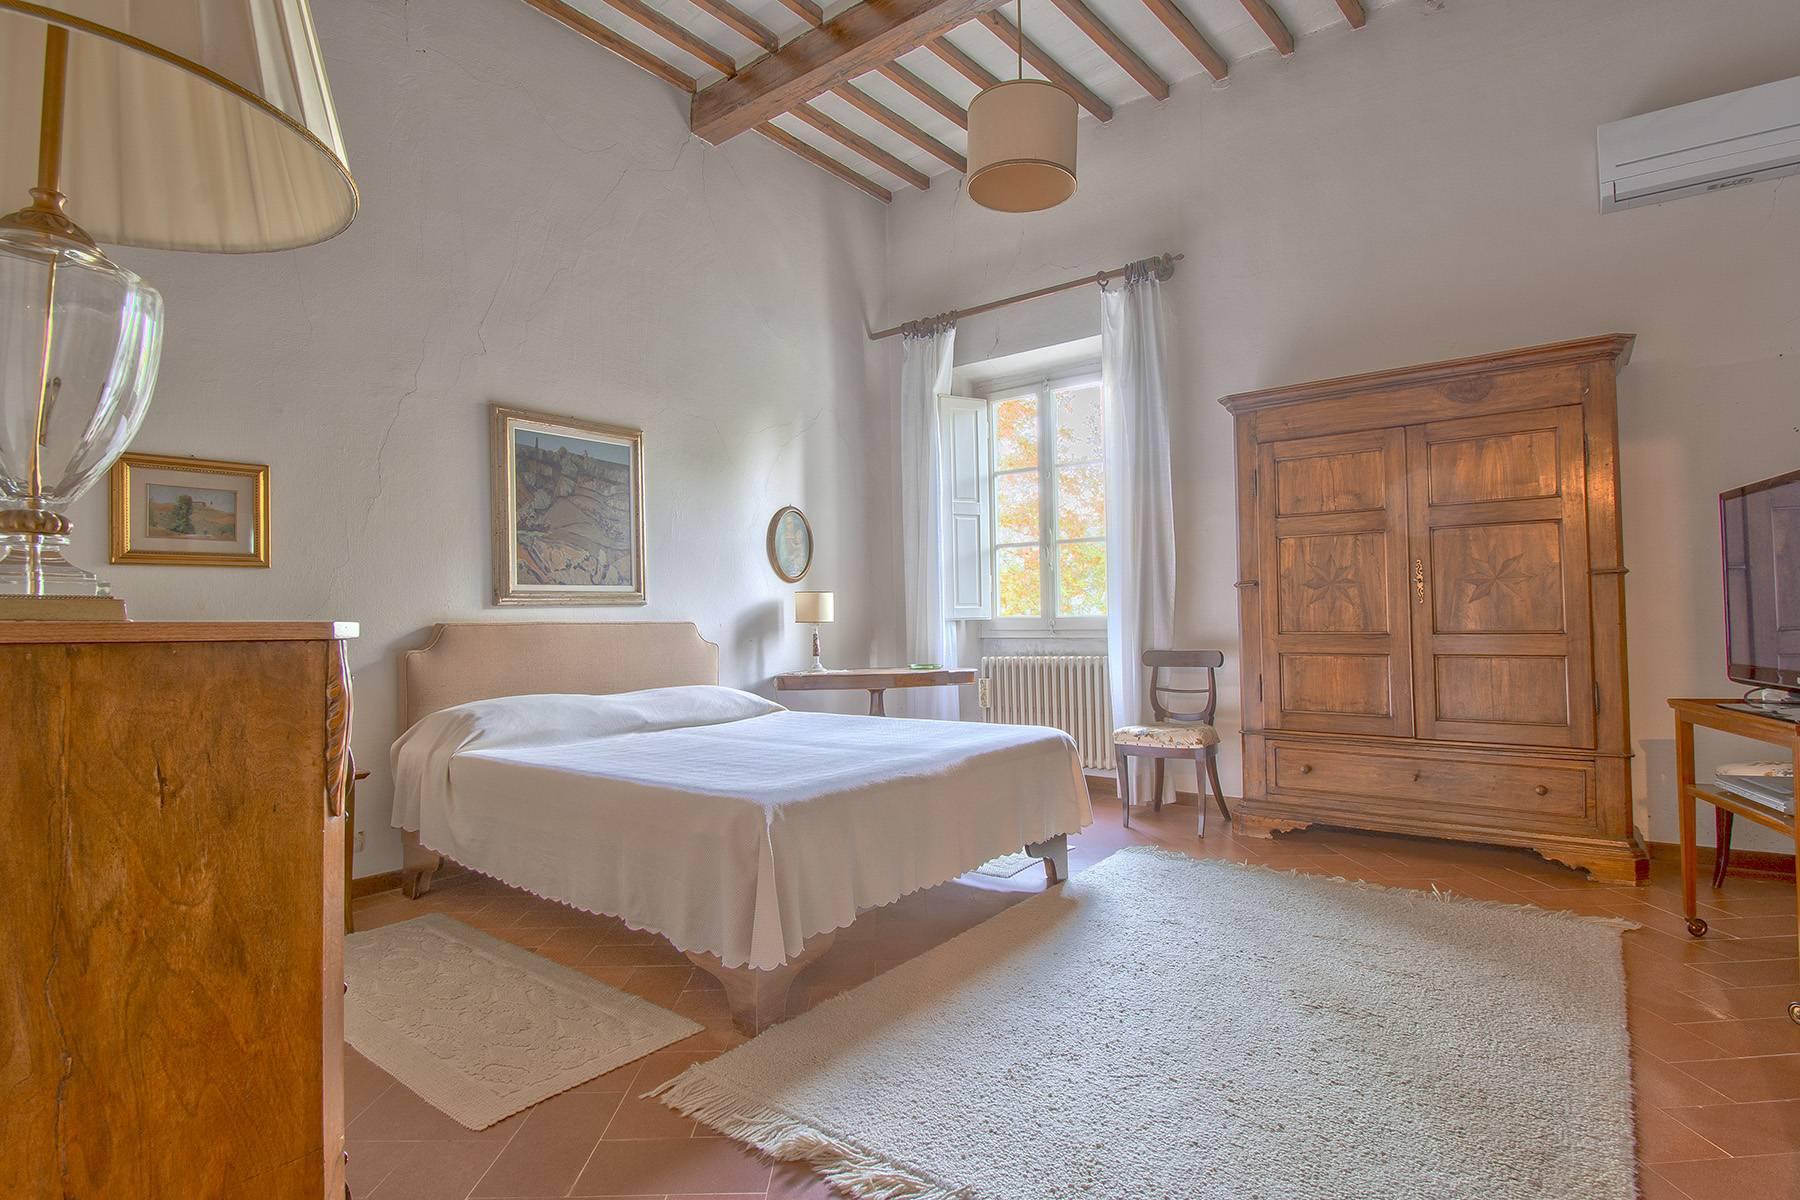 Winery with Historic Villa in San Miniato, Pisa - 13